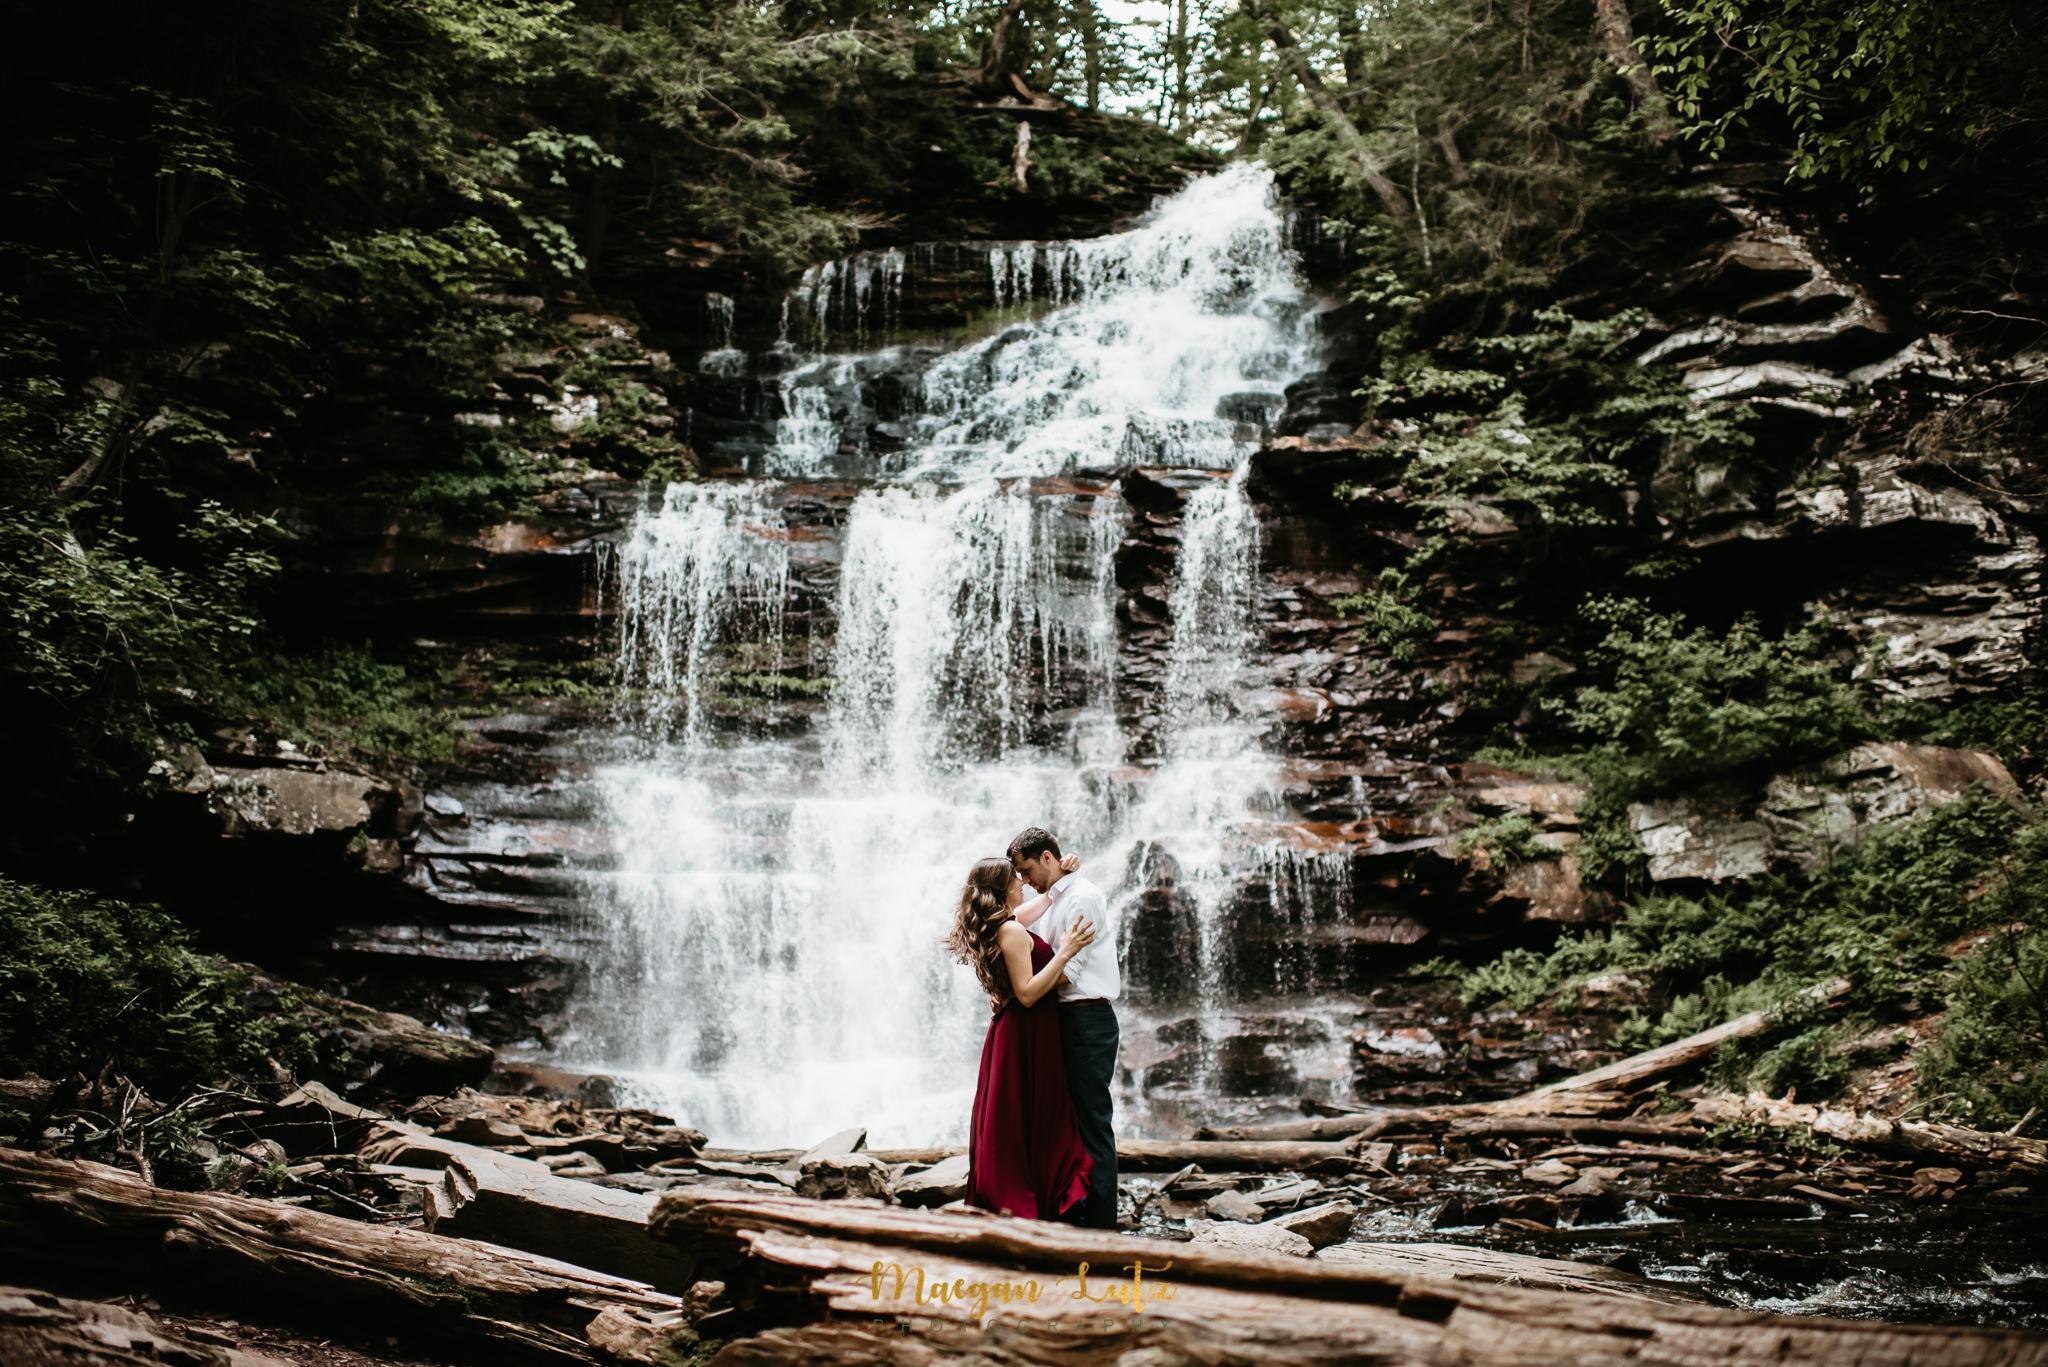 NEPA-Engagement-Wedding-Photographer-Session-at-Ricketts-Glen-State-Park-21.jpg